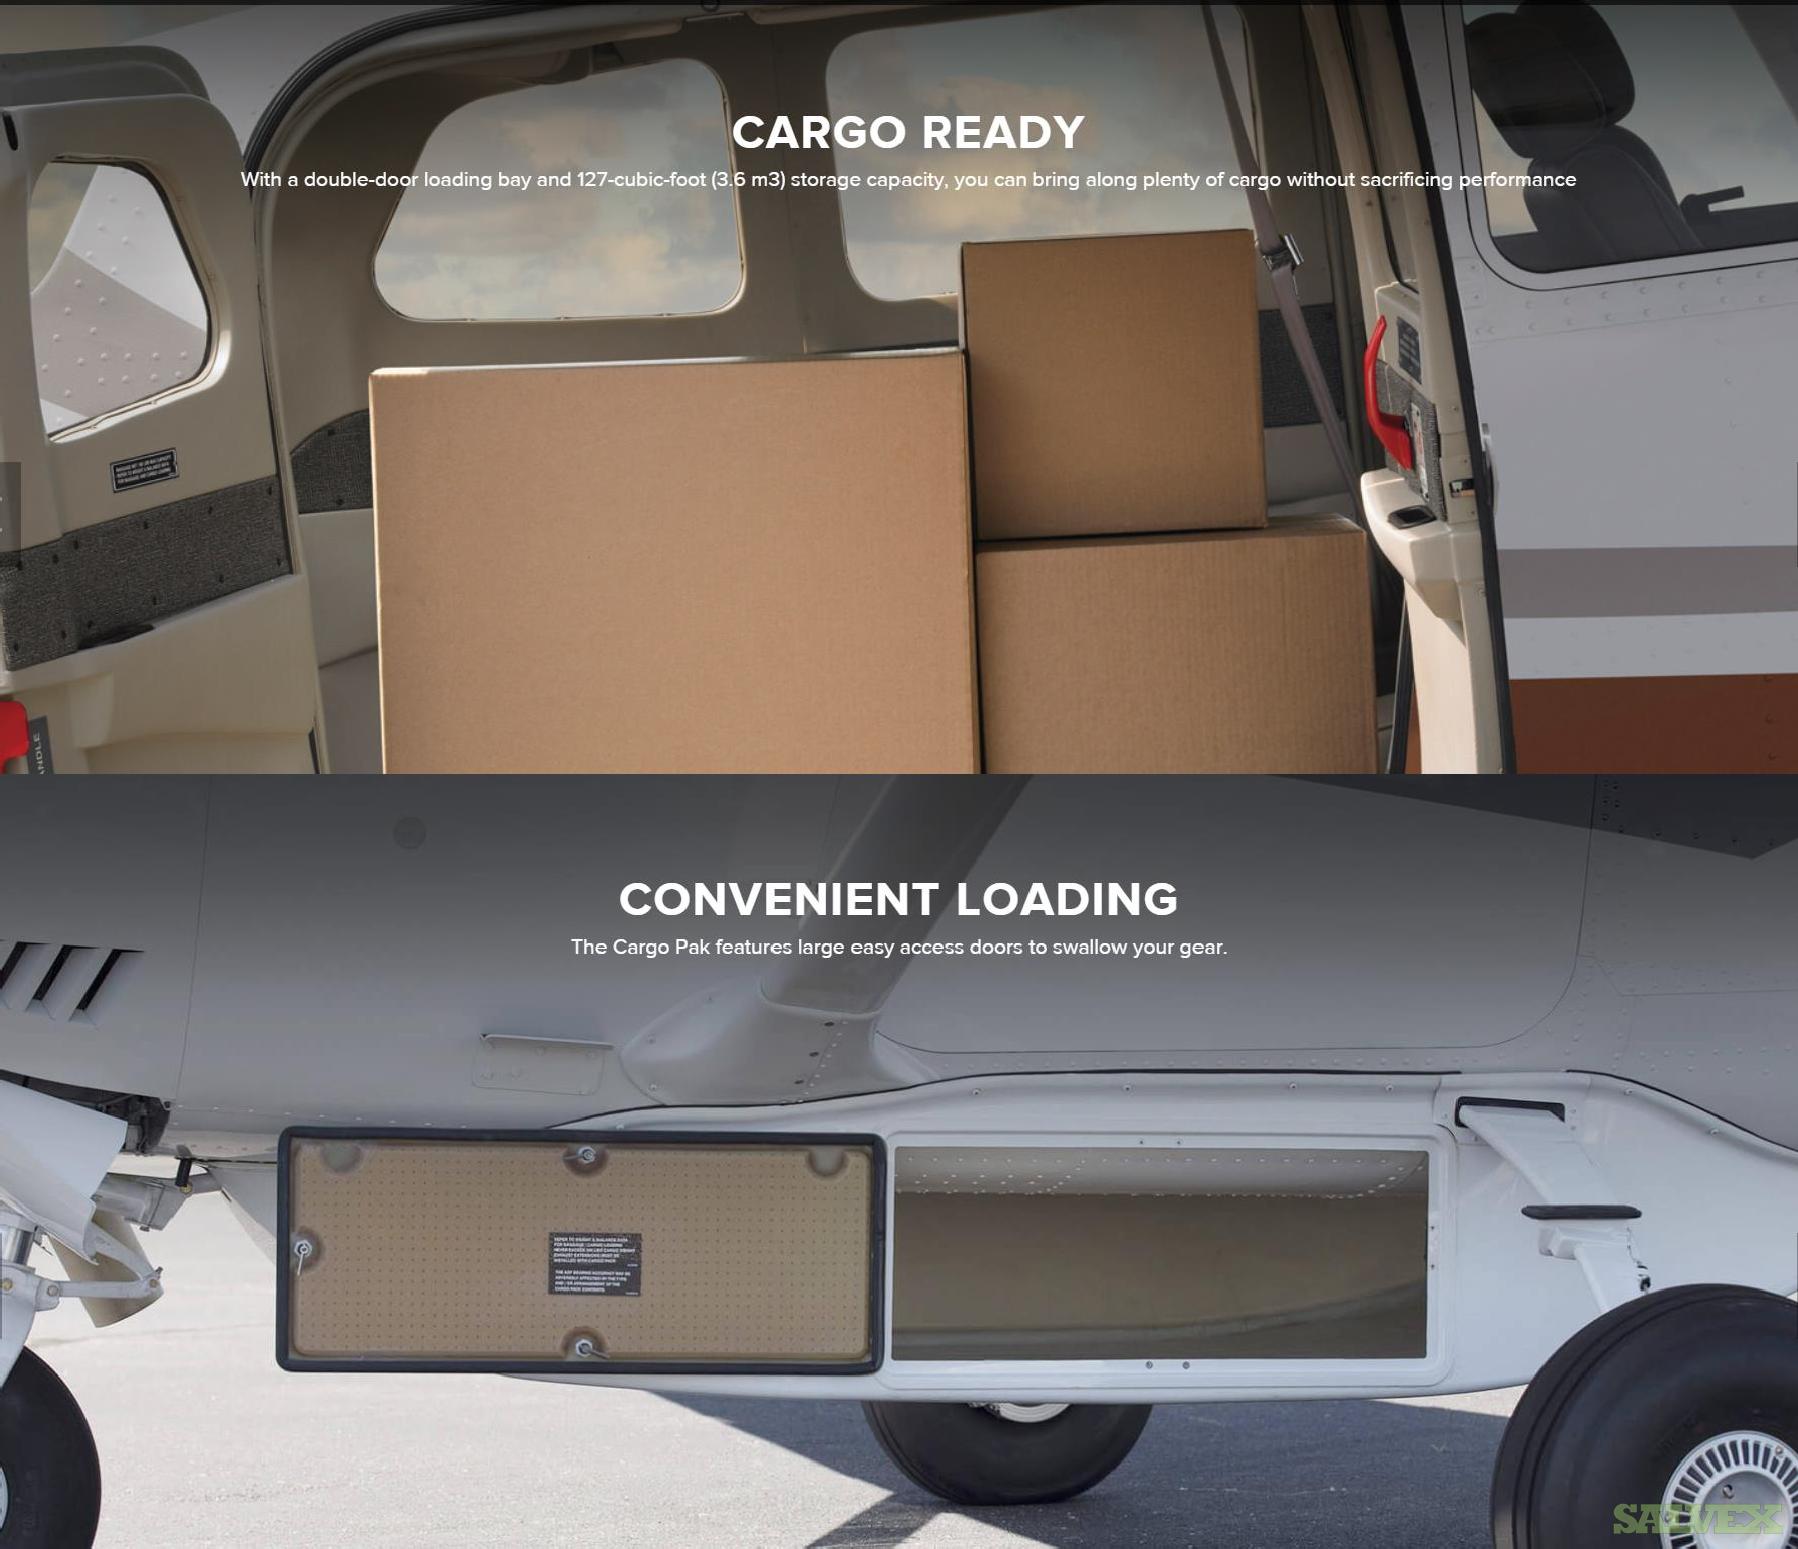 Cargo Loading & Convenient Loading